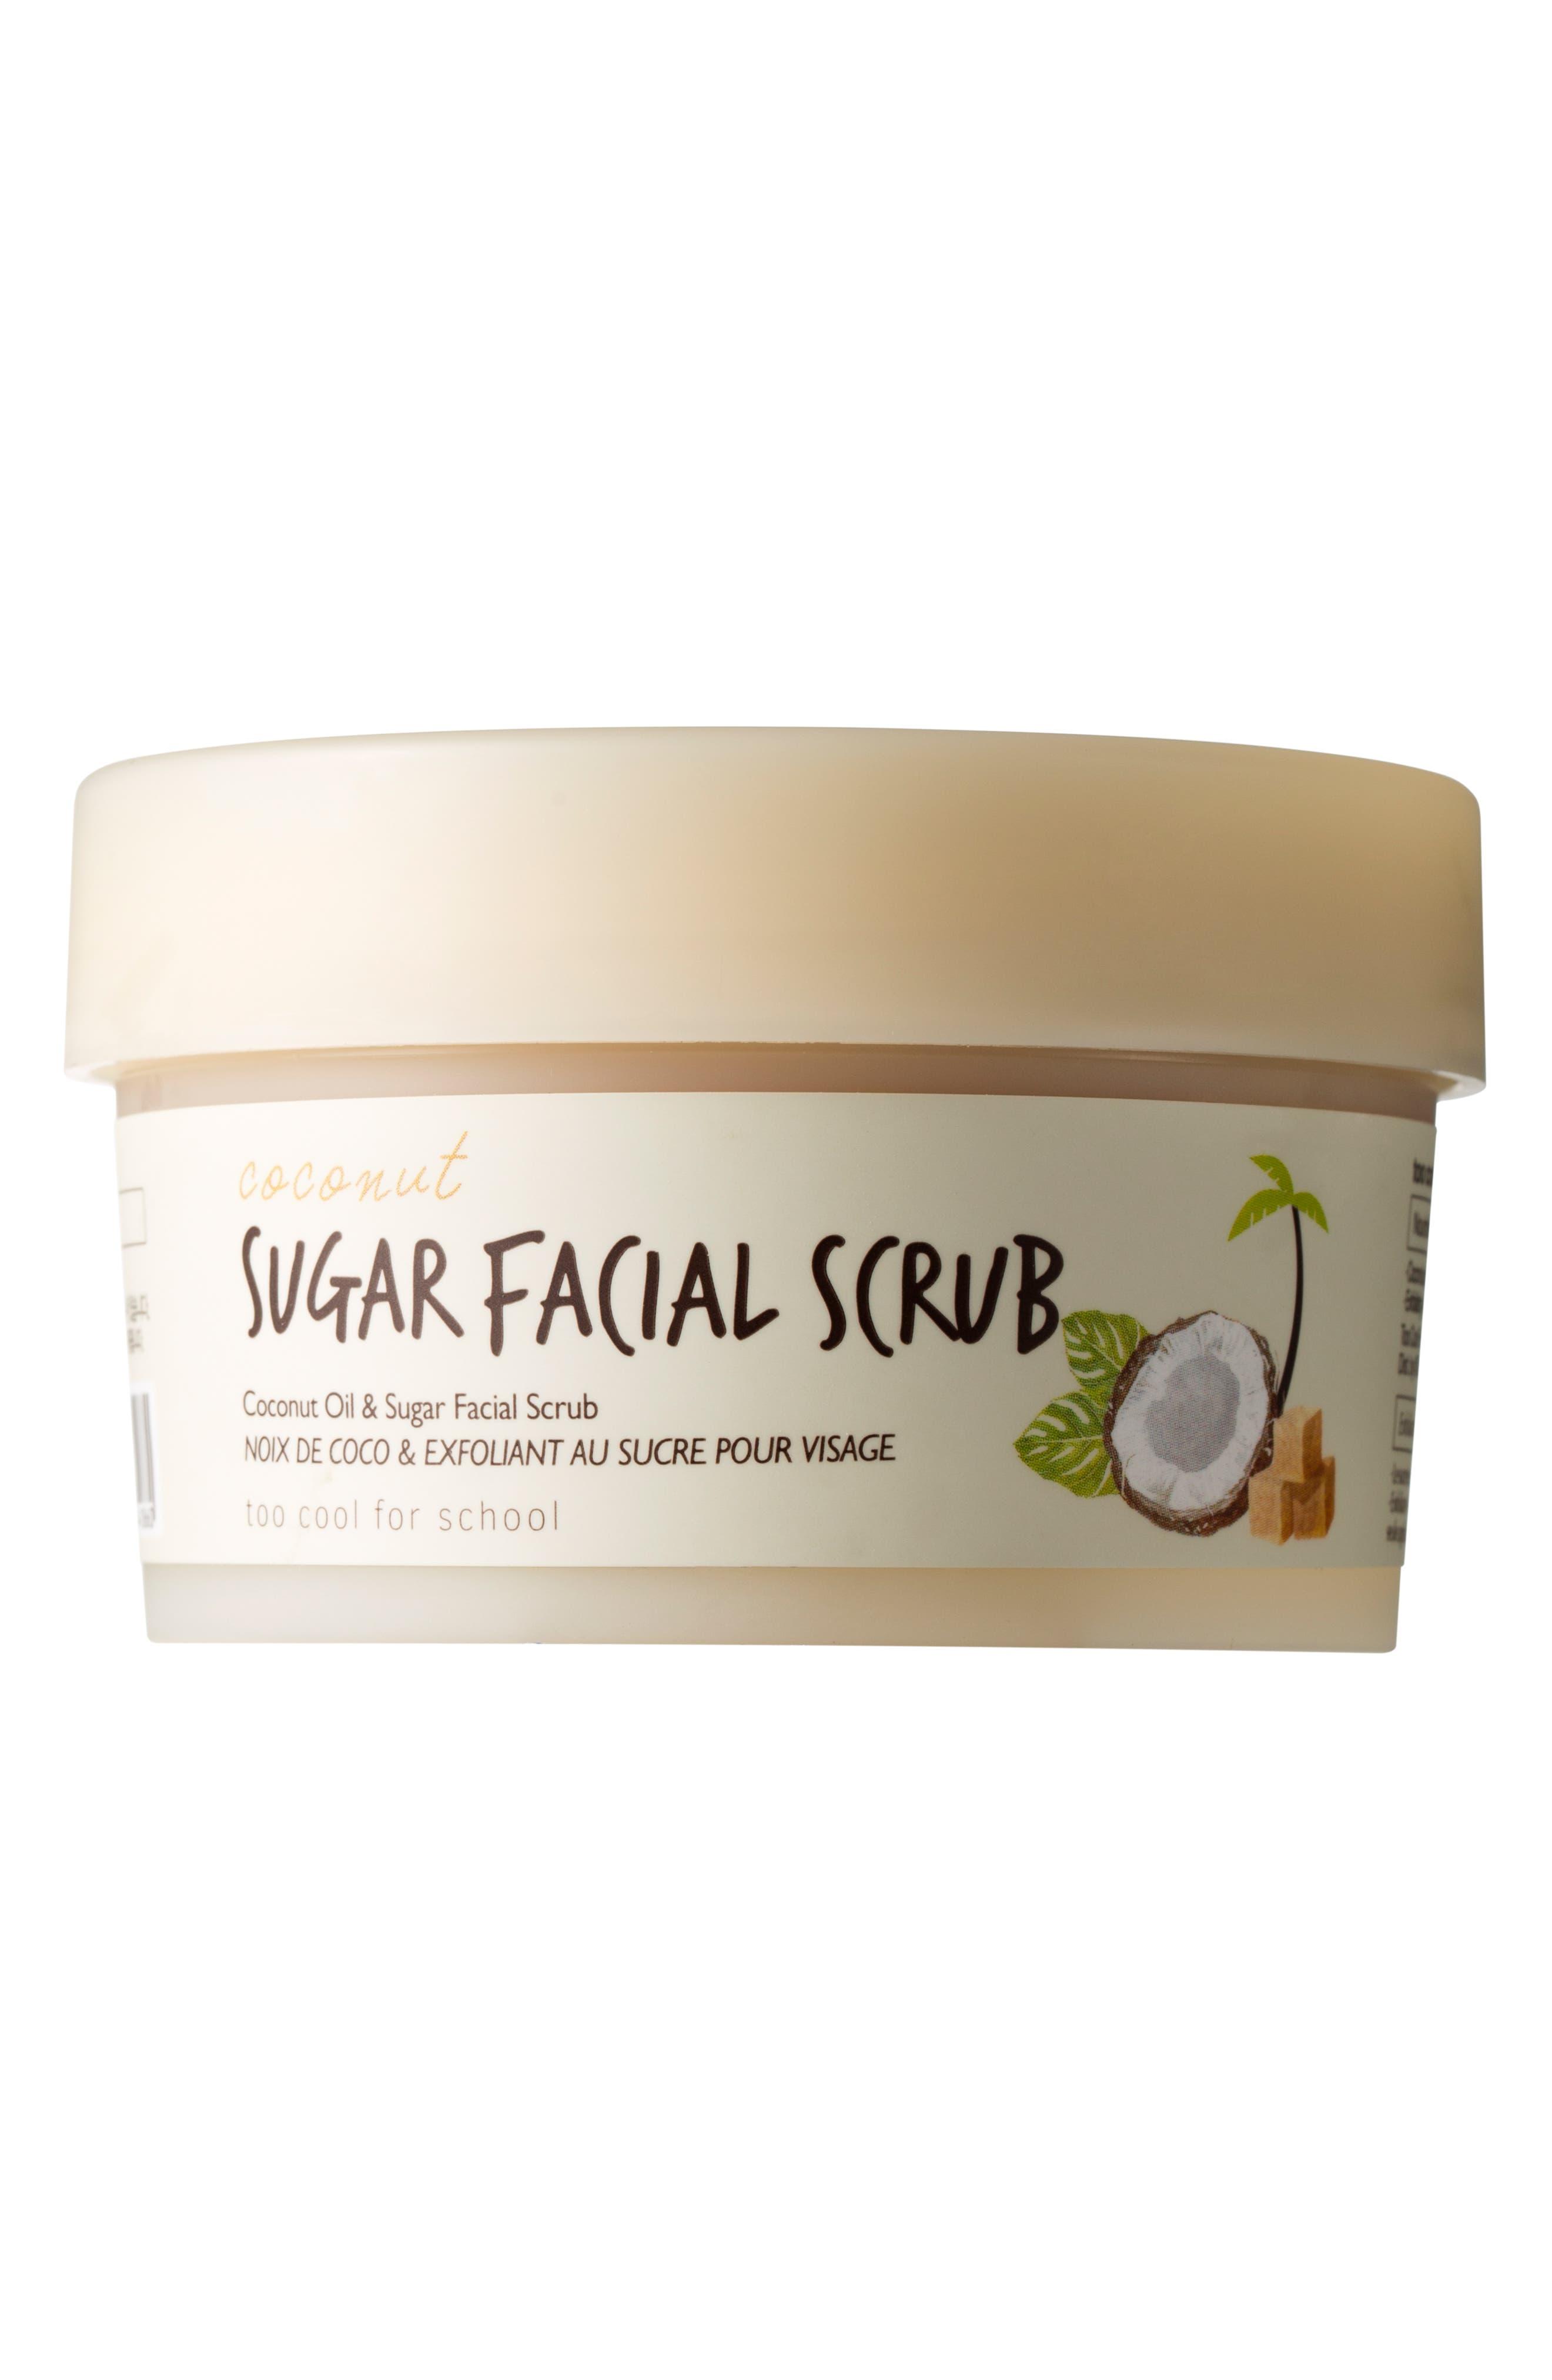 Coconut Sugar Facial Scrub,                             Main thumbnail 1, color,                             NO COLOR